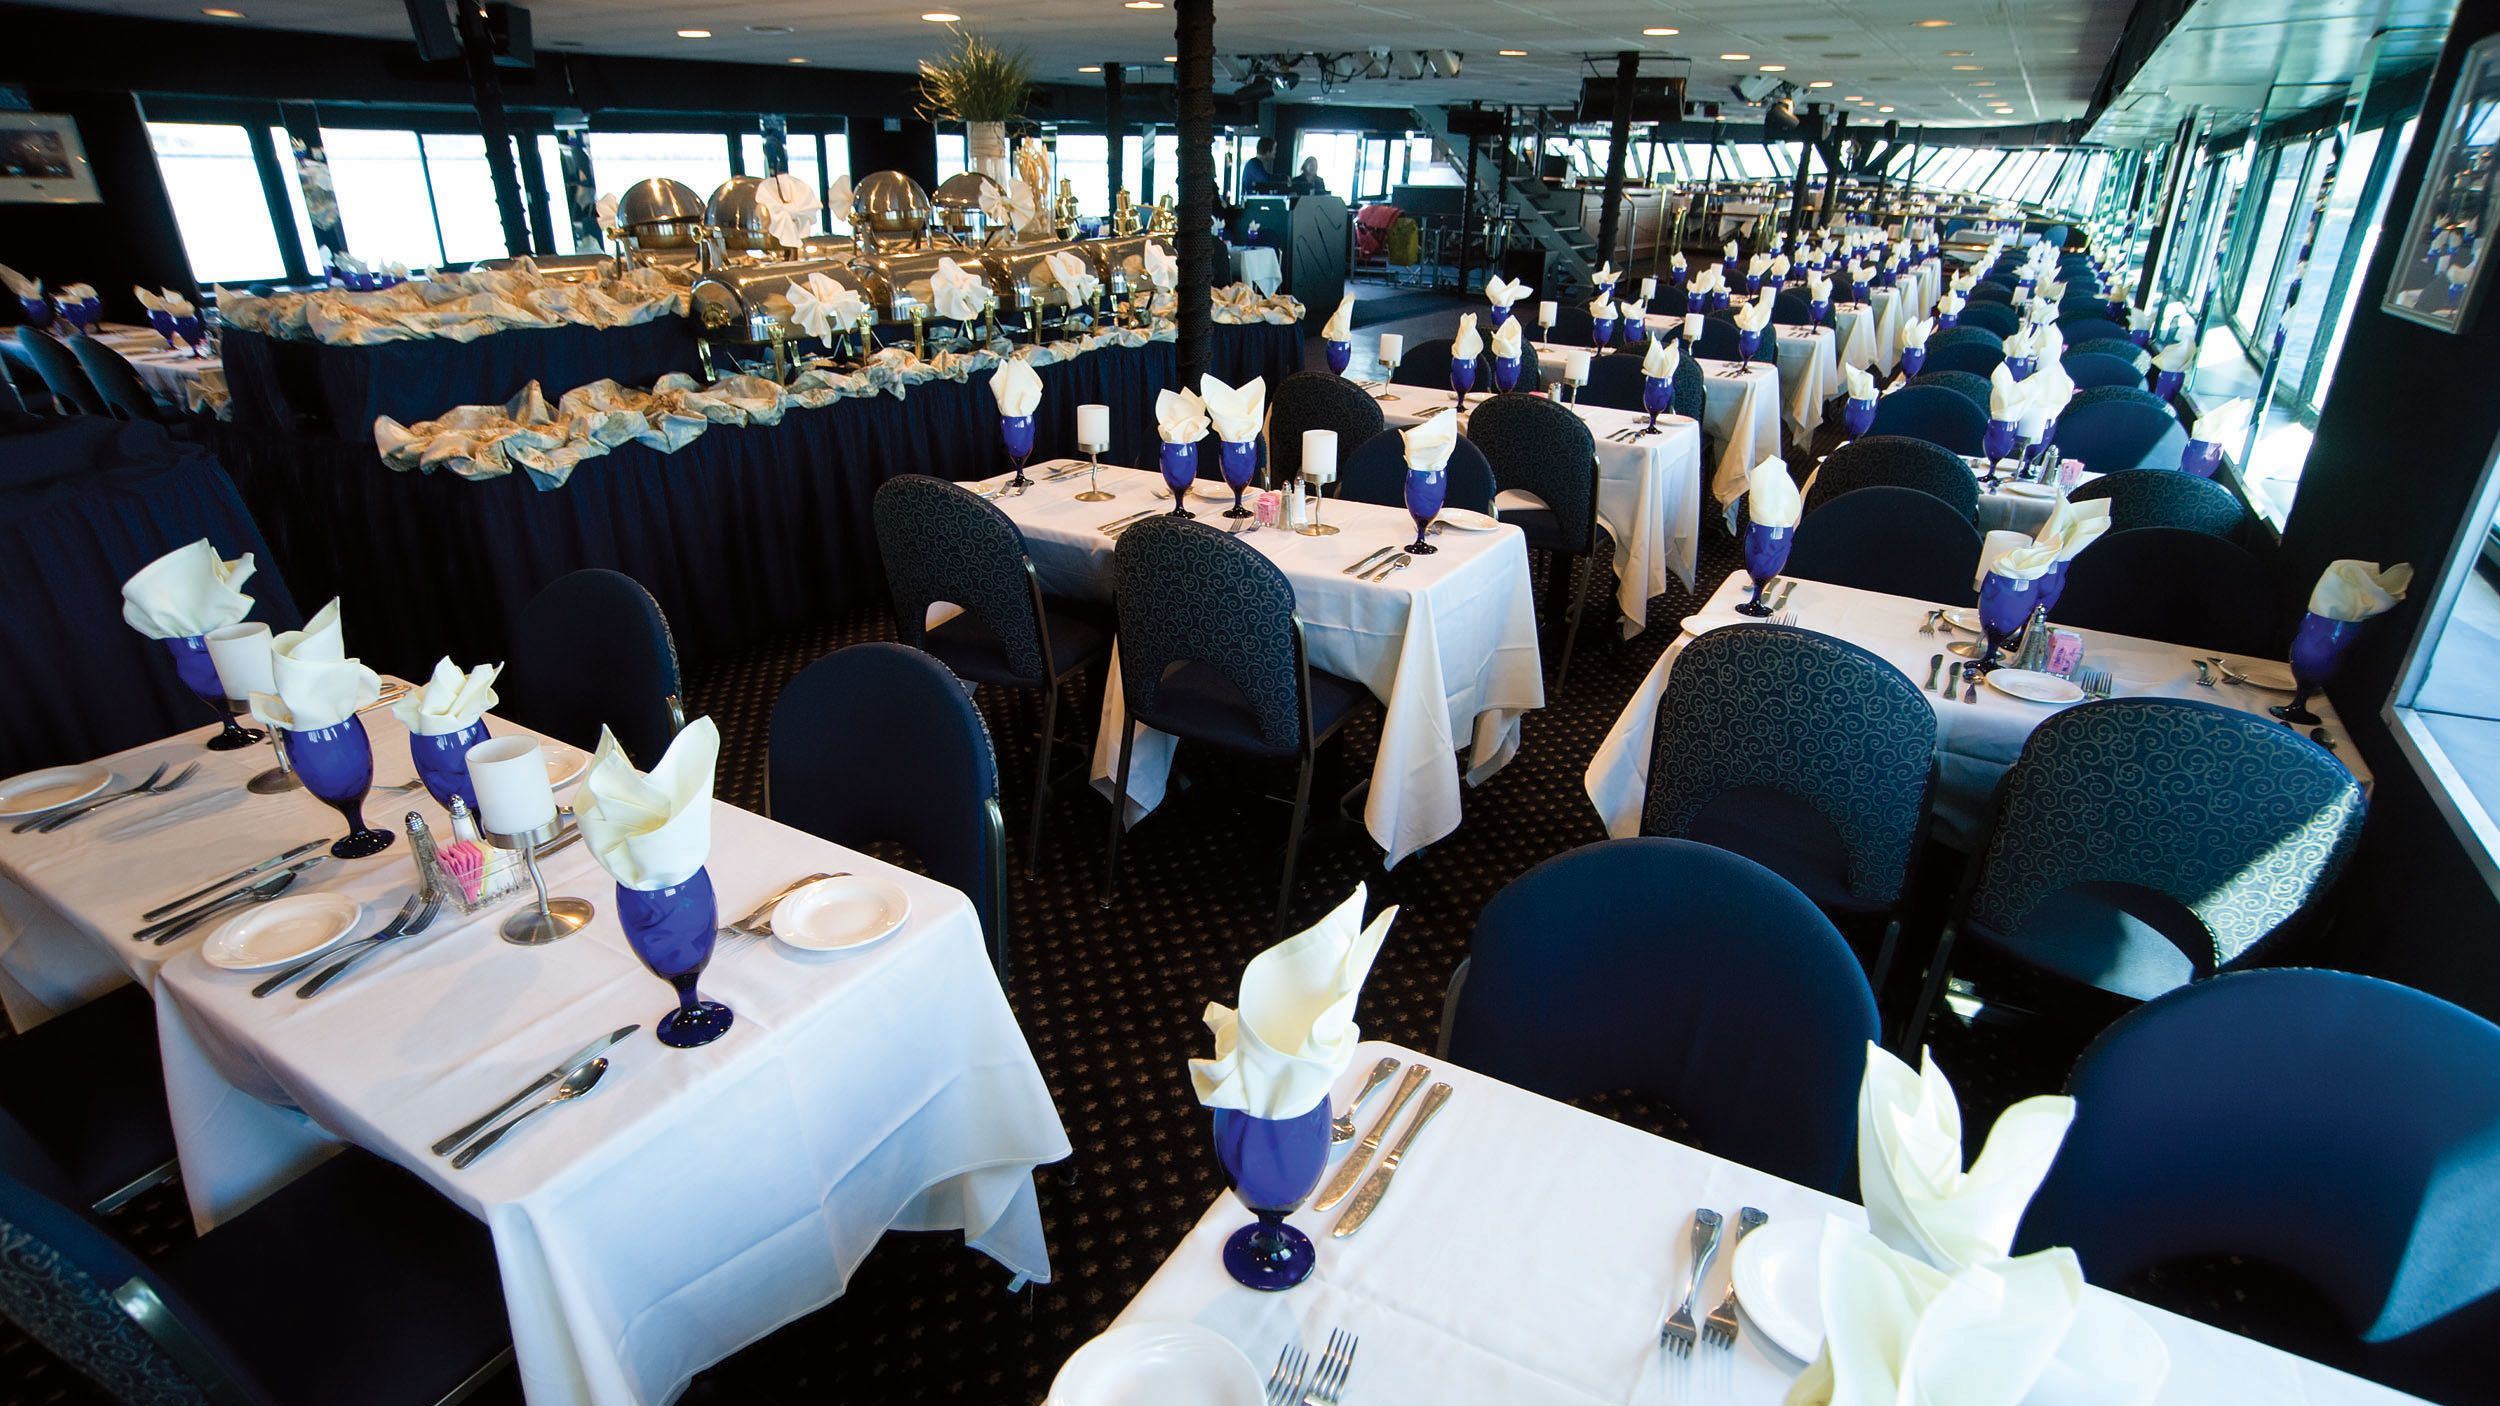 Interior dining room on the Spirit of Boston cruise ship